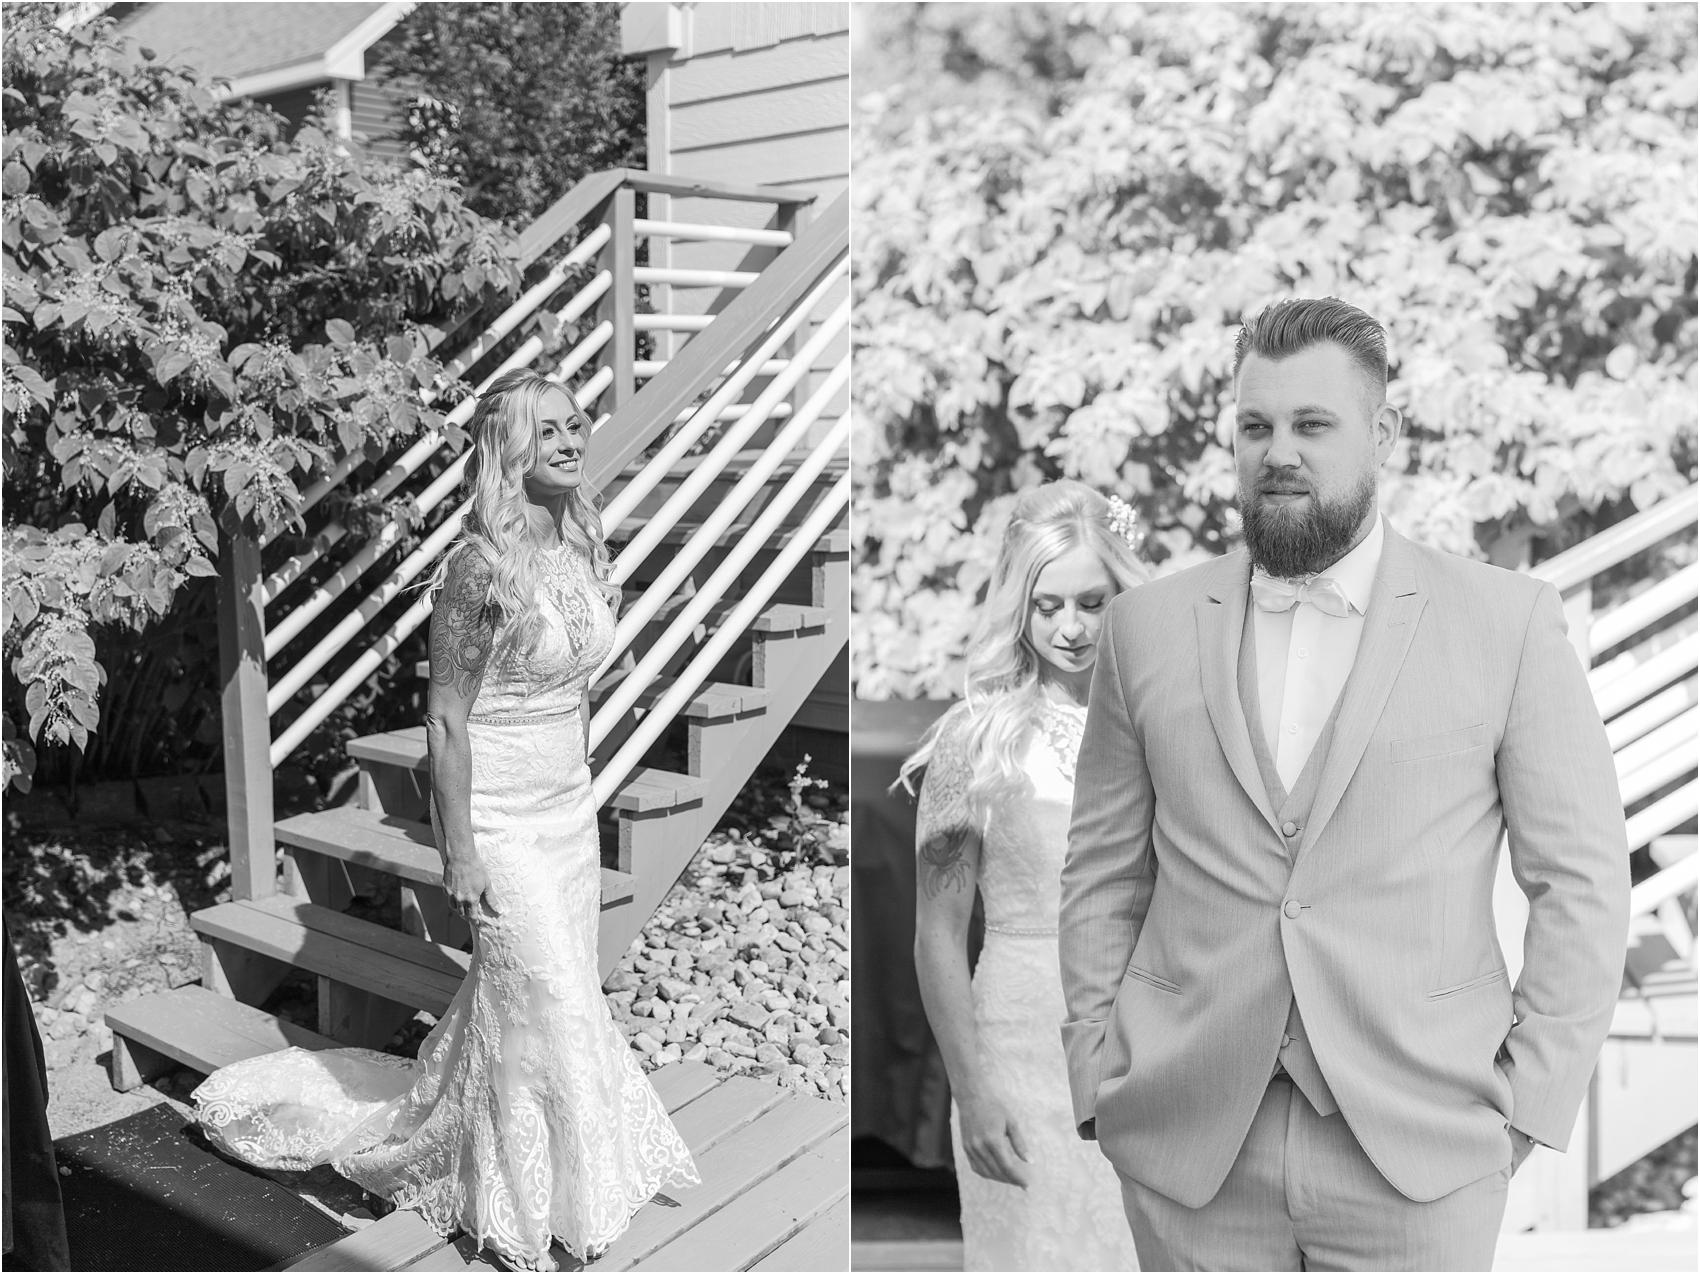 fun-whimsical-beach-wedding-photos-in-st-joseph-michigan-by-courtney-carolyn-photography_0017.jpg